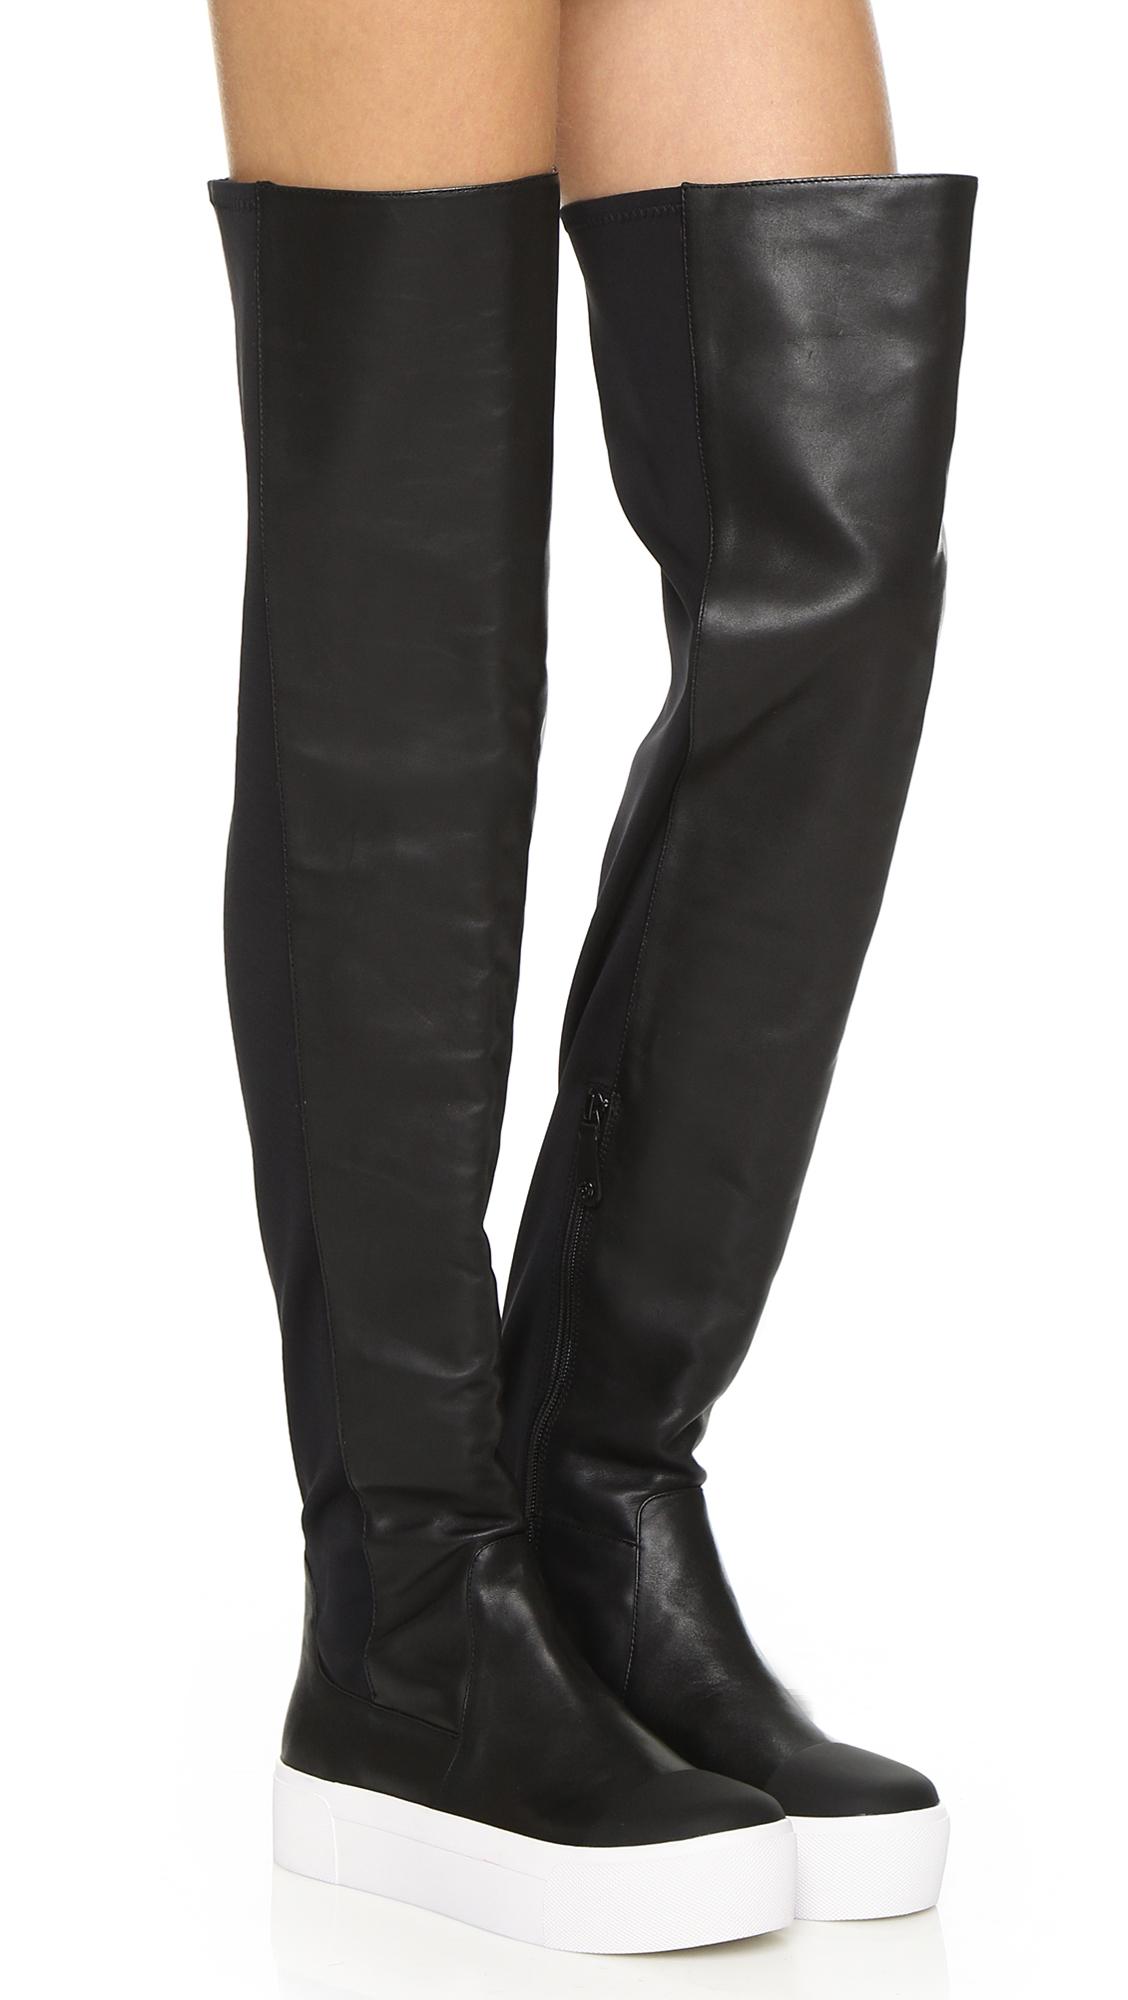 c020bdc6b35 DKNY Brenda Over The Knee Sneaker Boots - Black in Black - Lyst